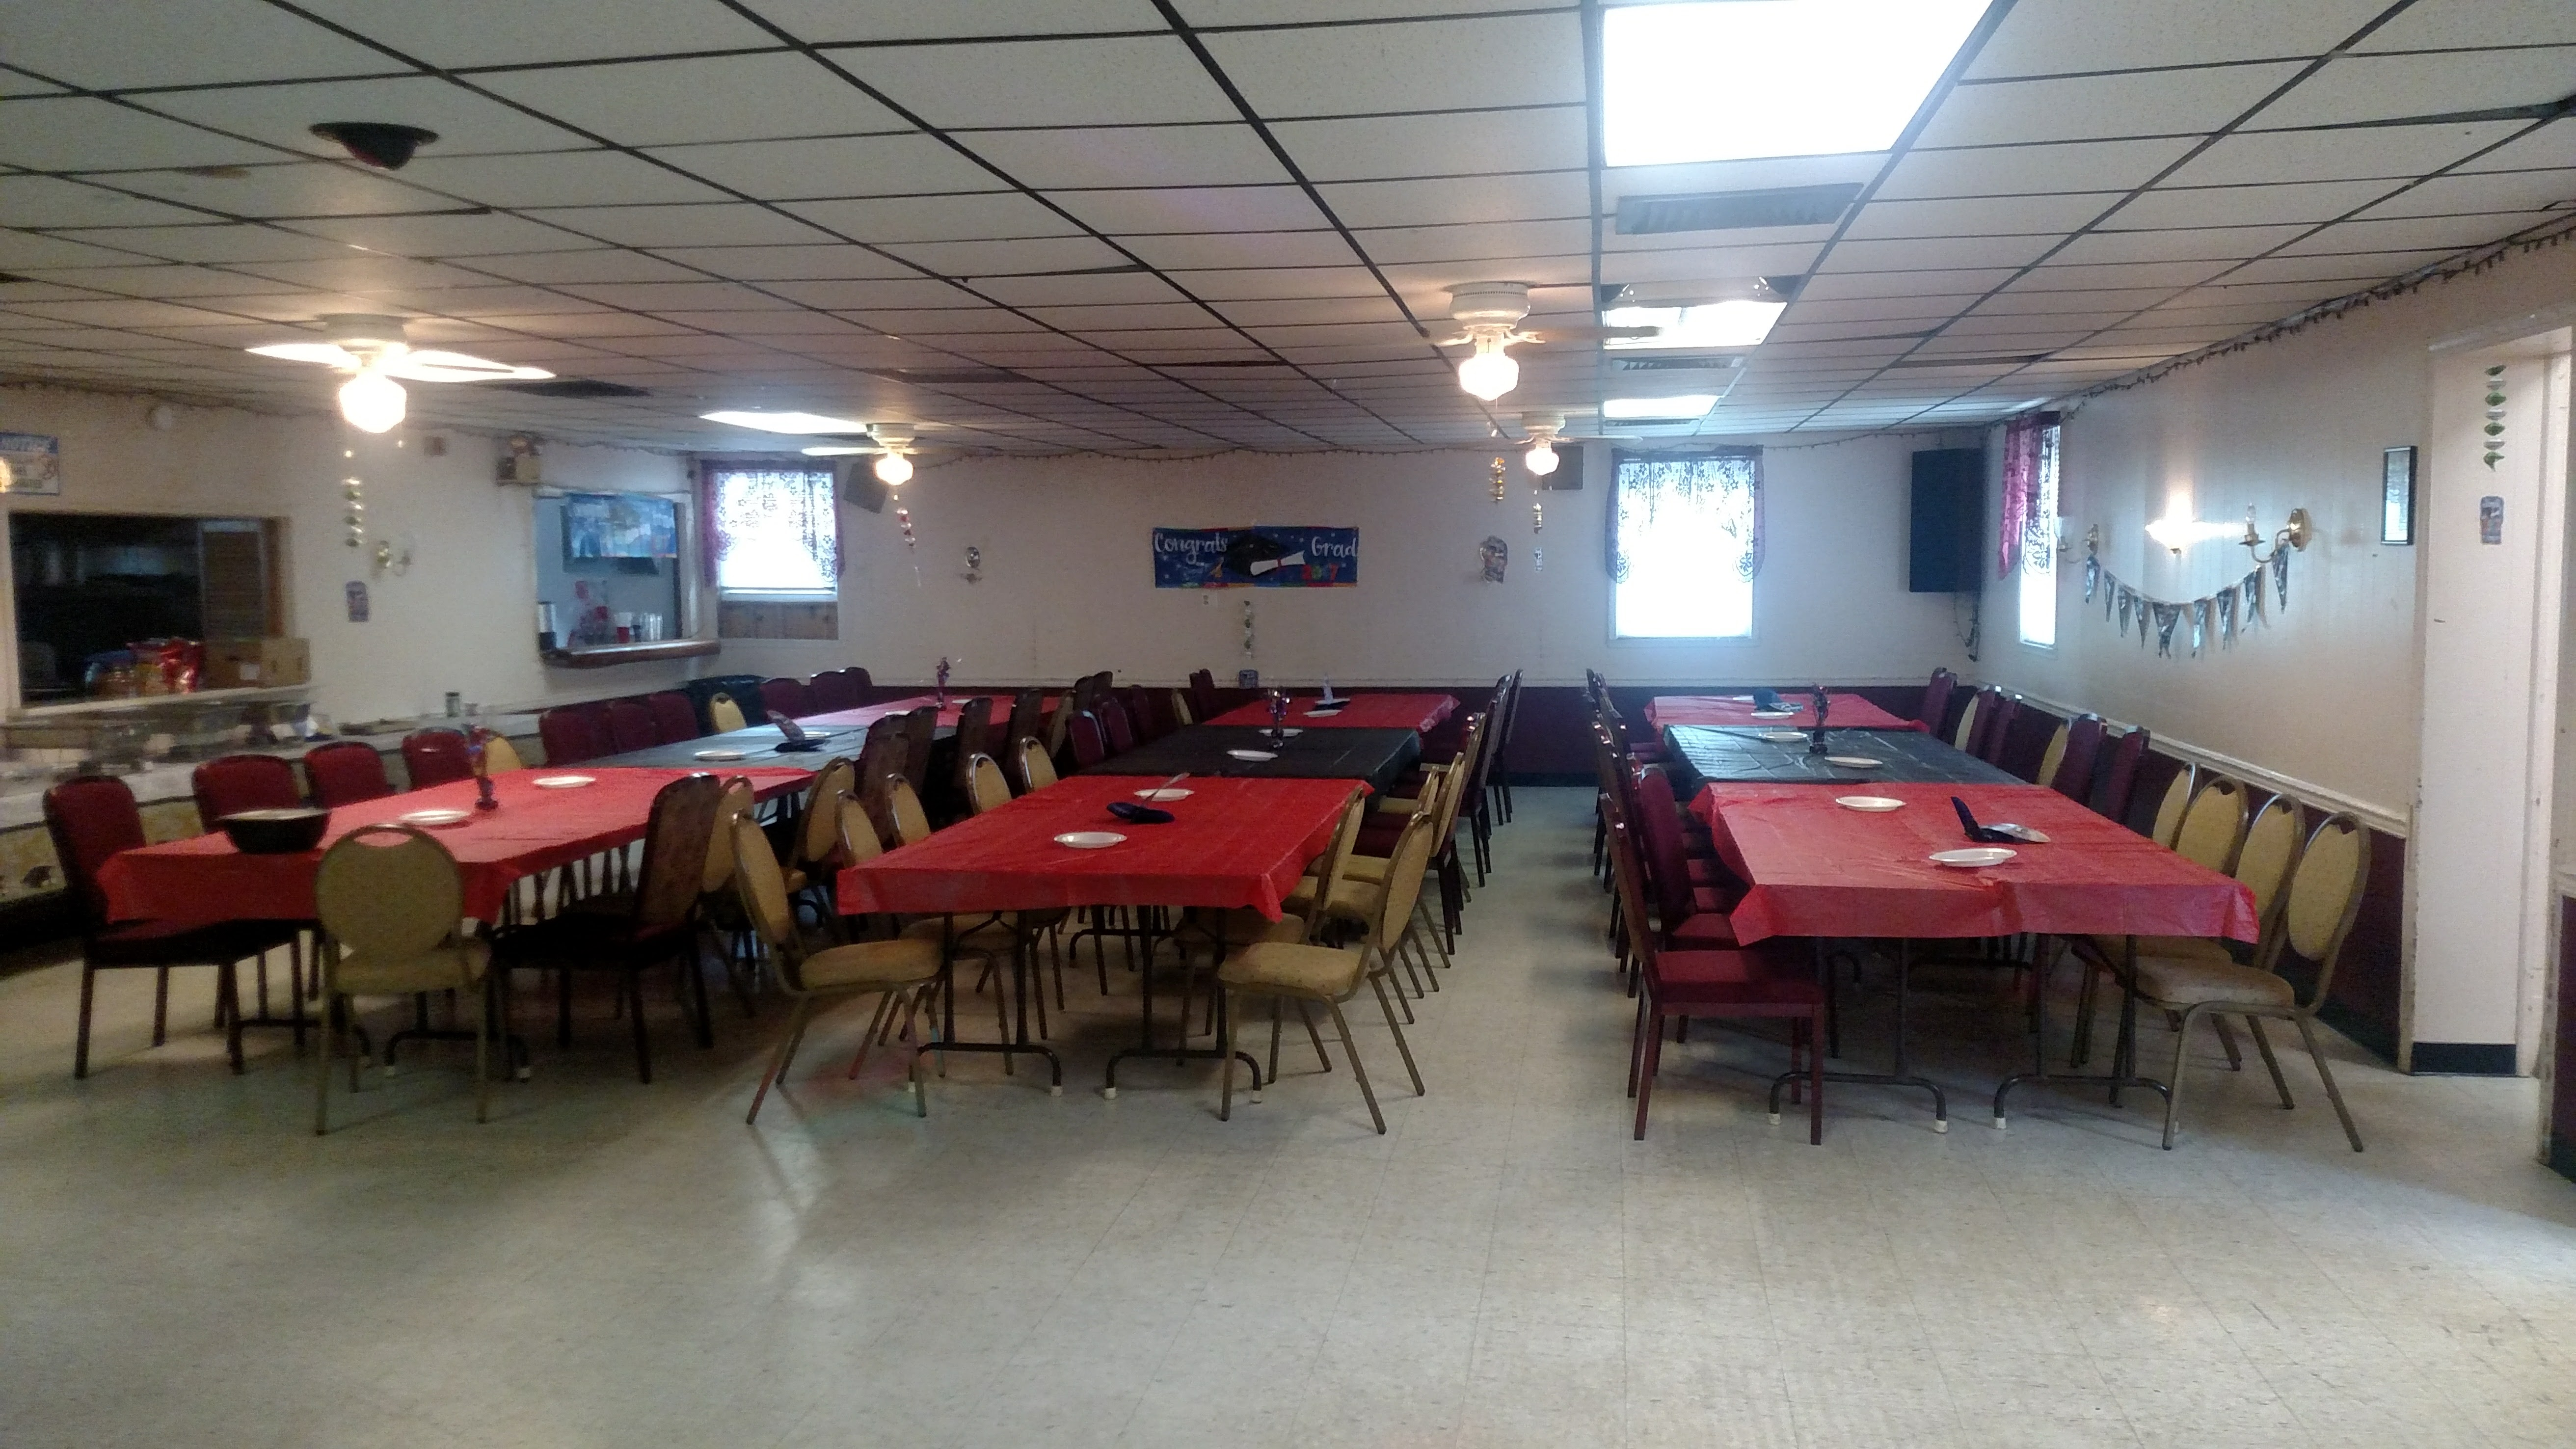 Cost Of Air Conditioner >> VFW Post 217 - Westville VFW Hall Rentals in Westville, NJ